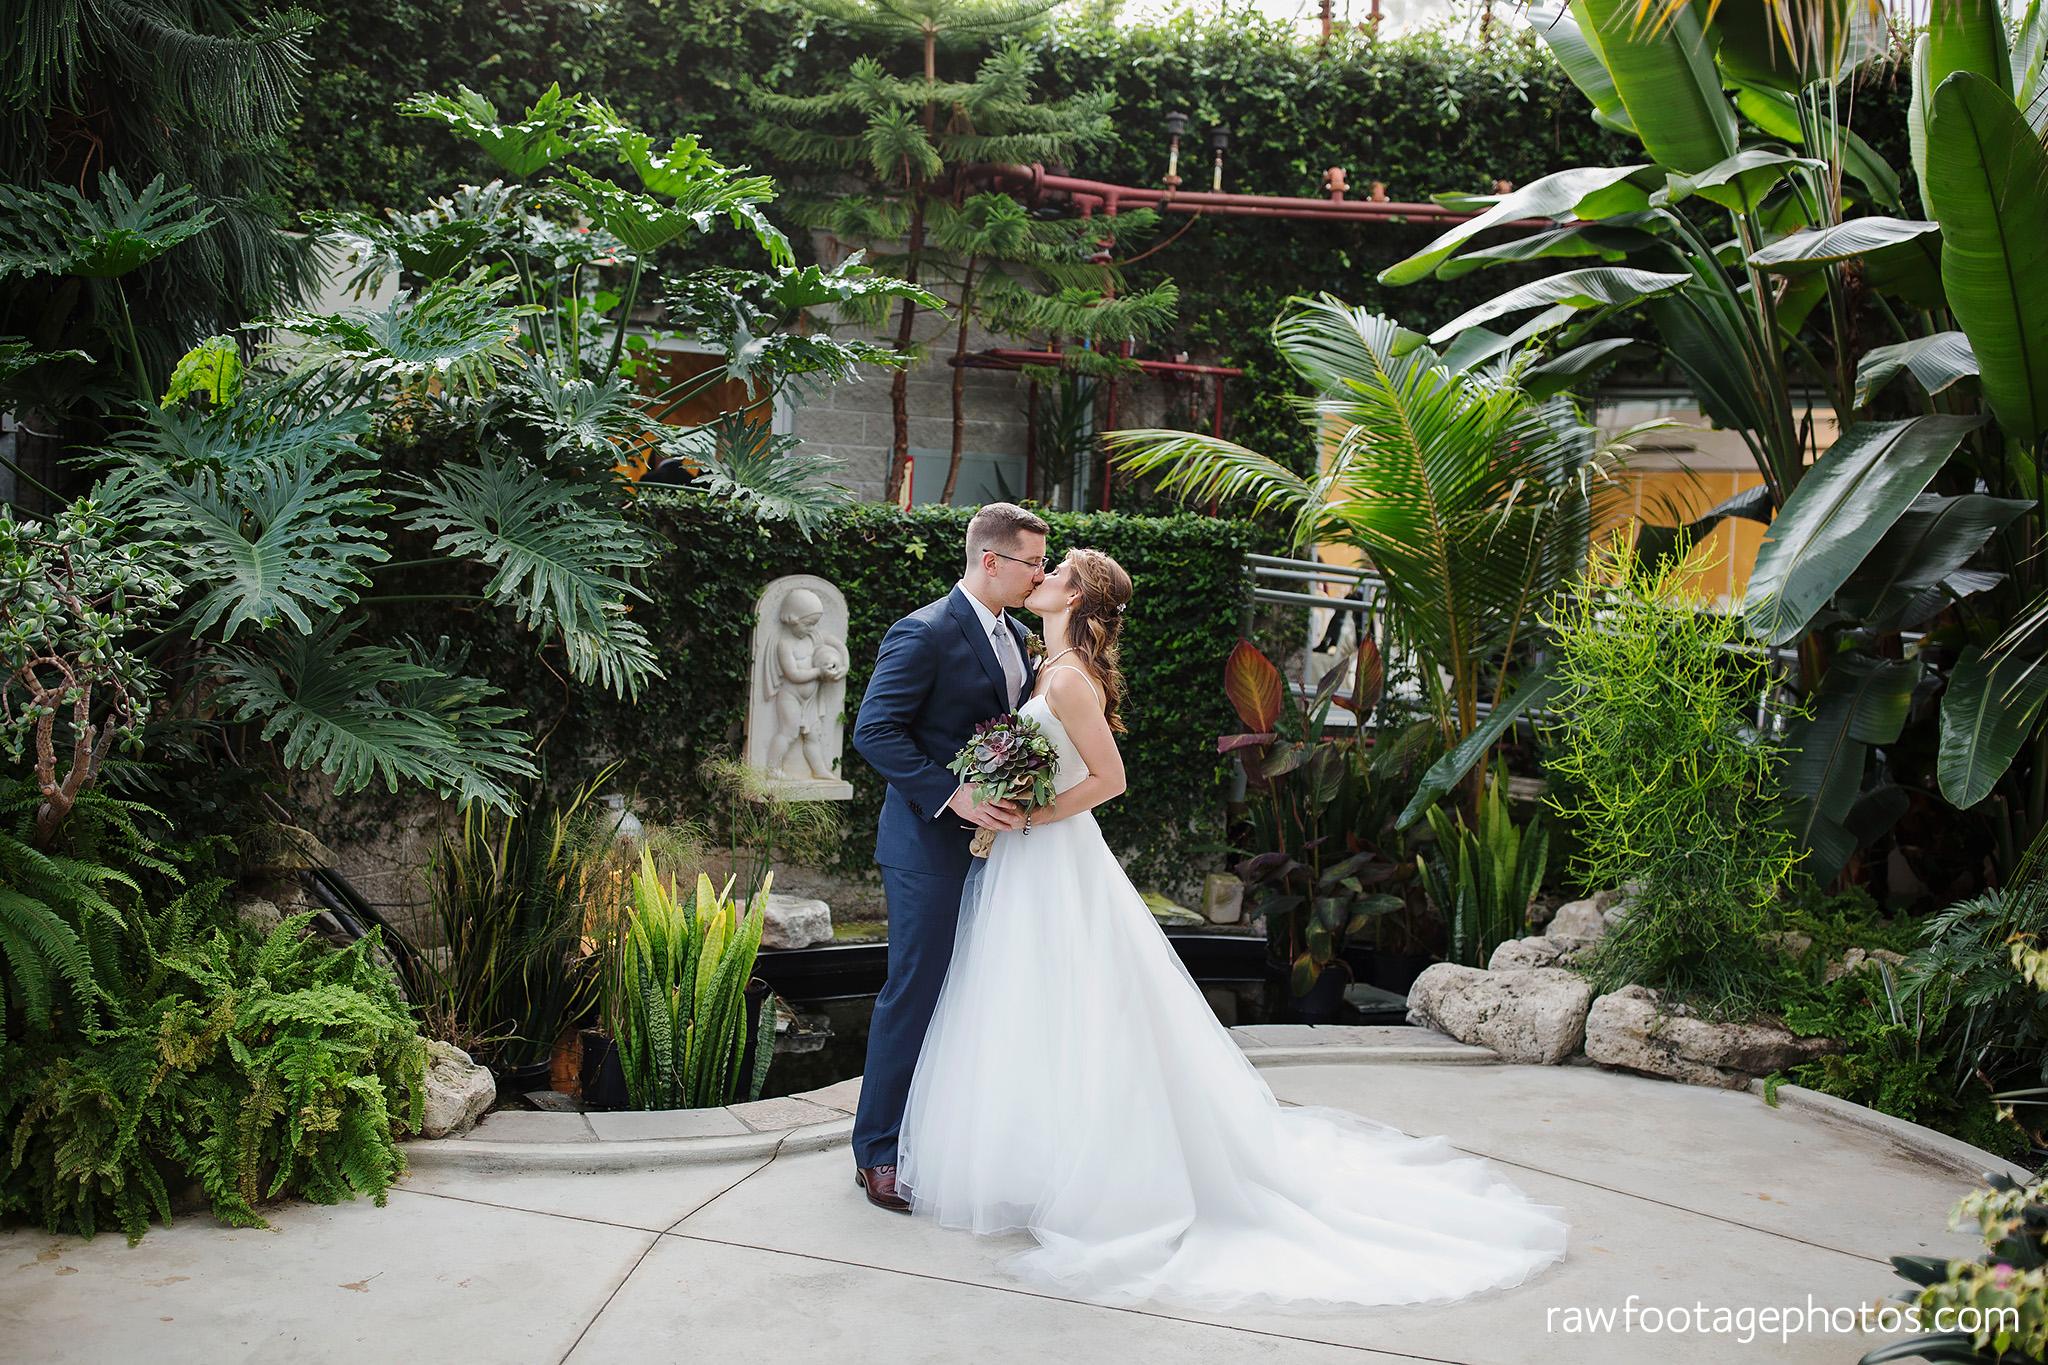 london_ontario_wedding_photographer-civic_gardens-springbank_park-succulent_bouquet-fall_wedding-bridge-raw_footage_photography046.jpg